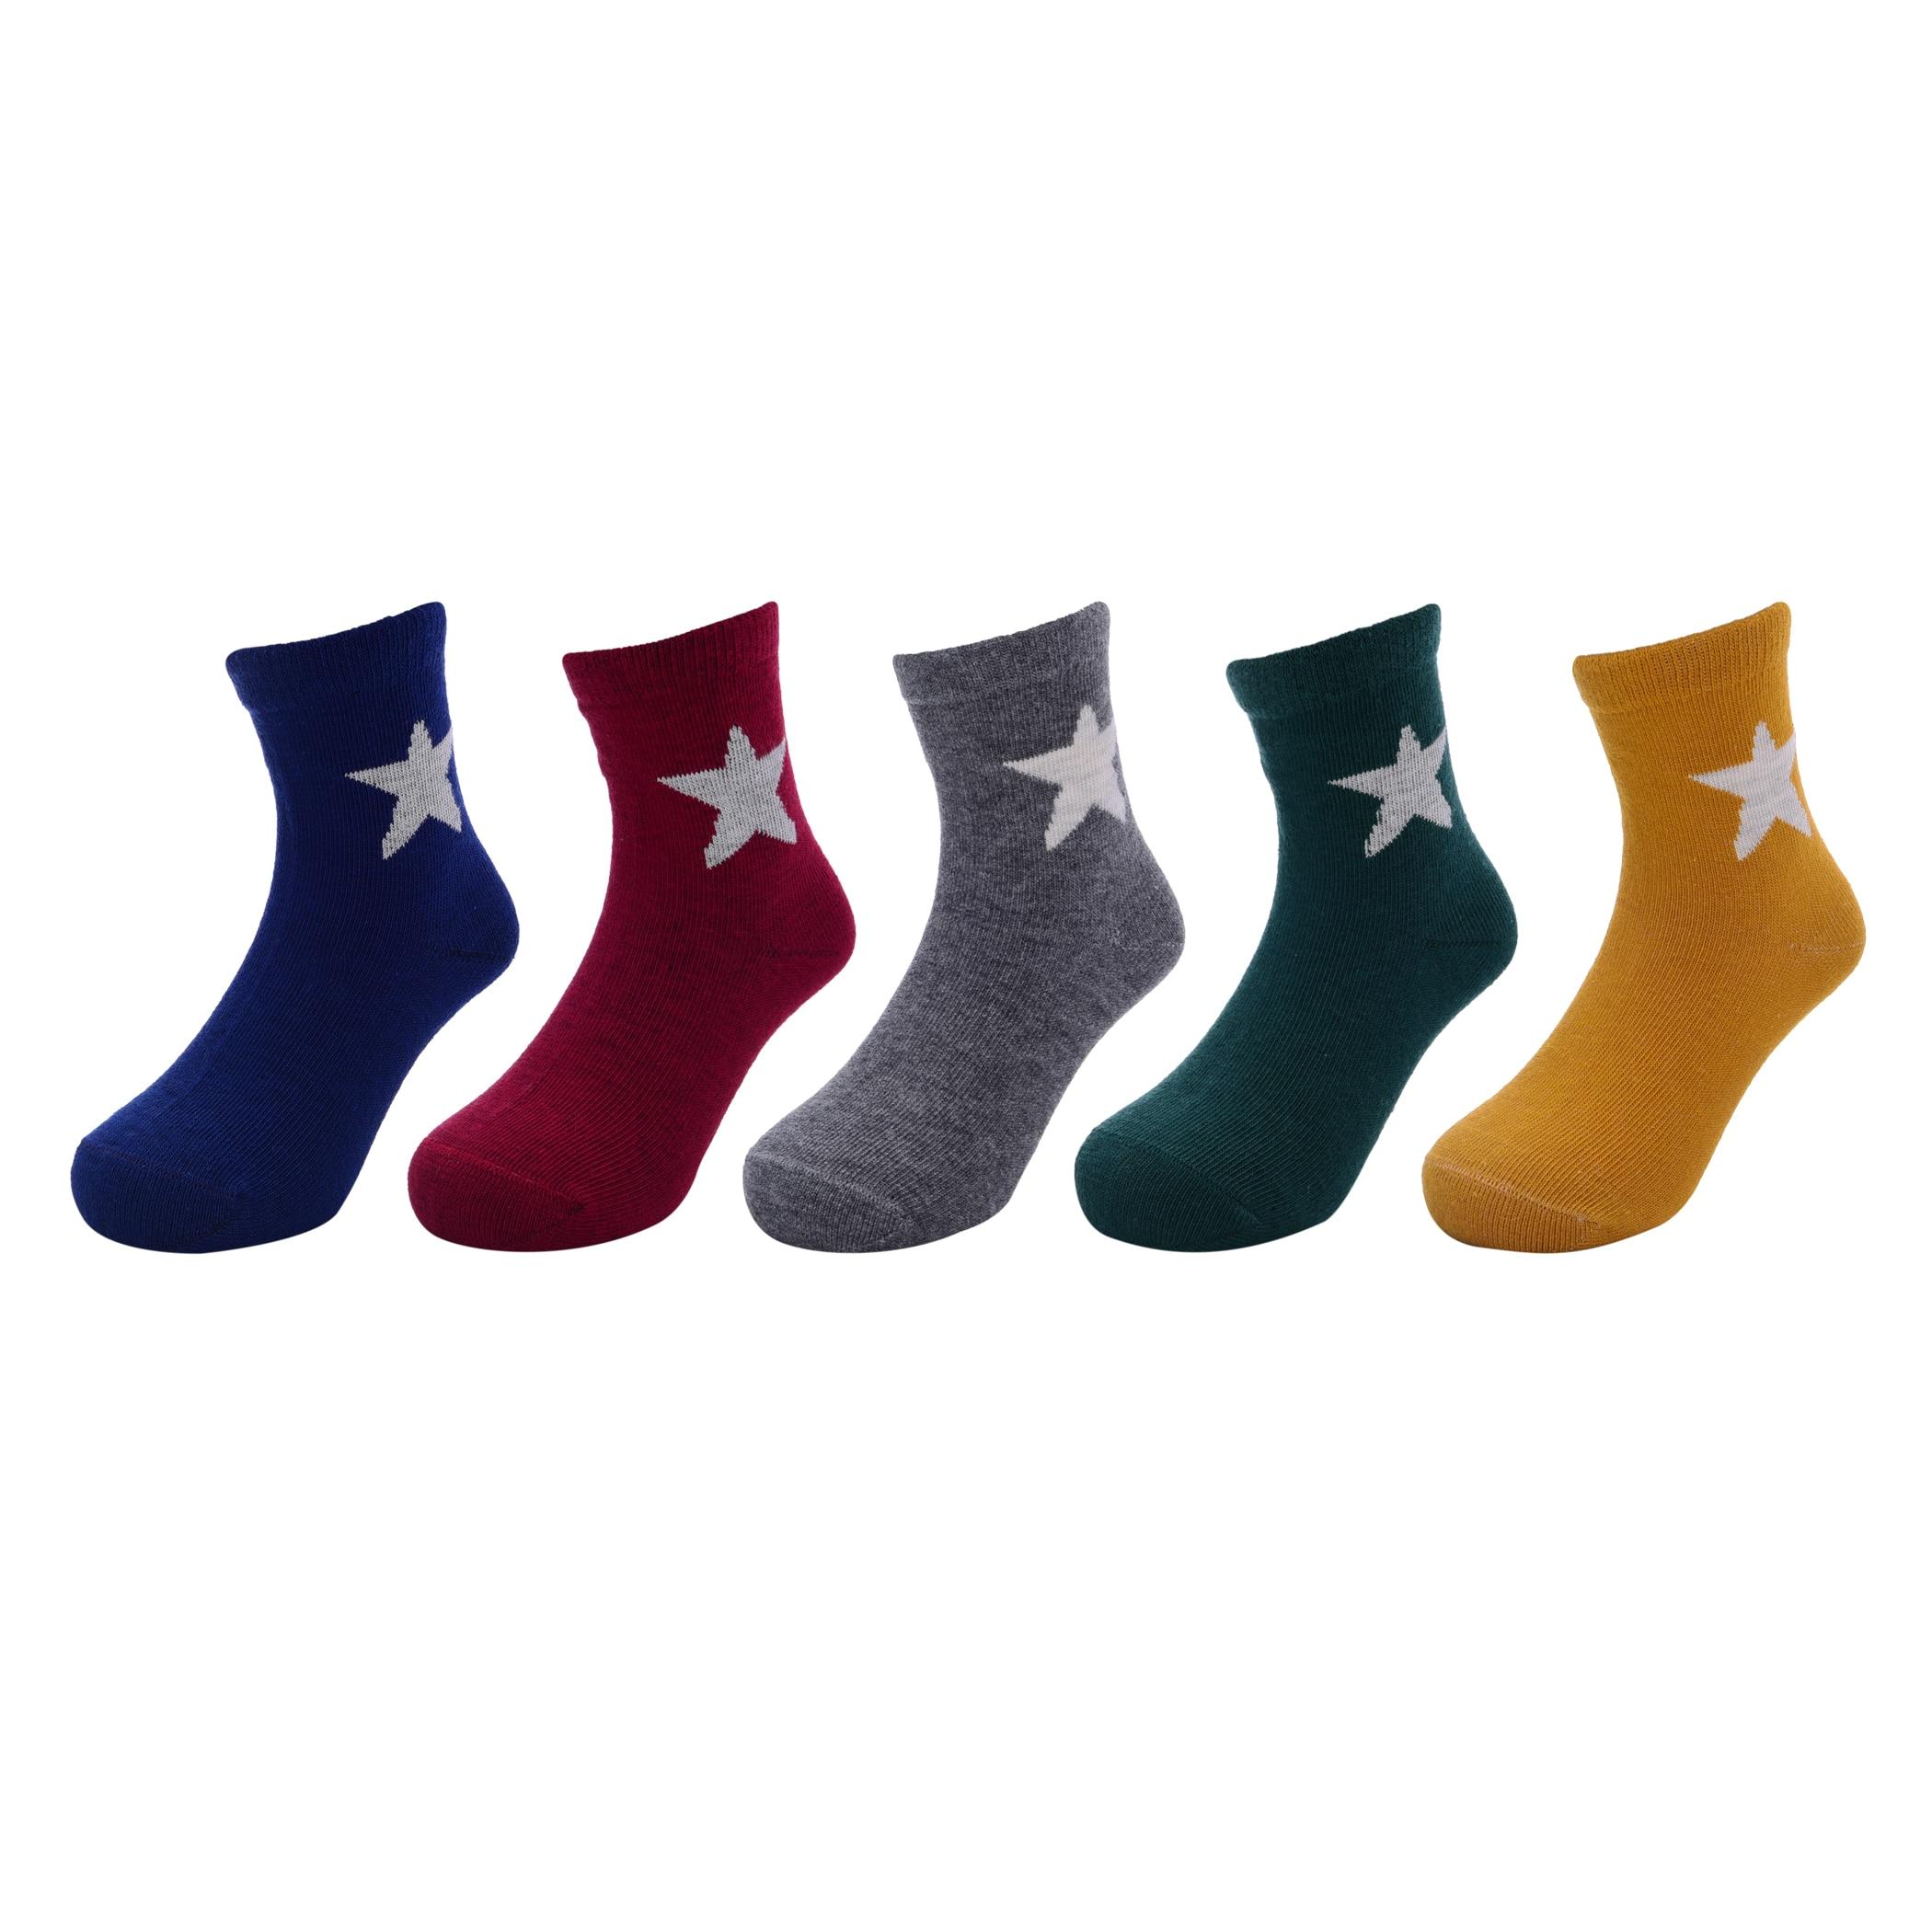 5 Pairs/lot Kid Boys Socks Cotton Print Star Fashion Children Socks For 3-12 Years